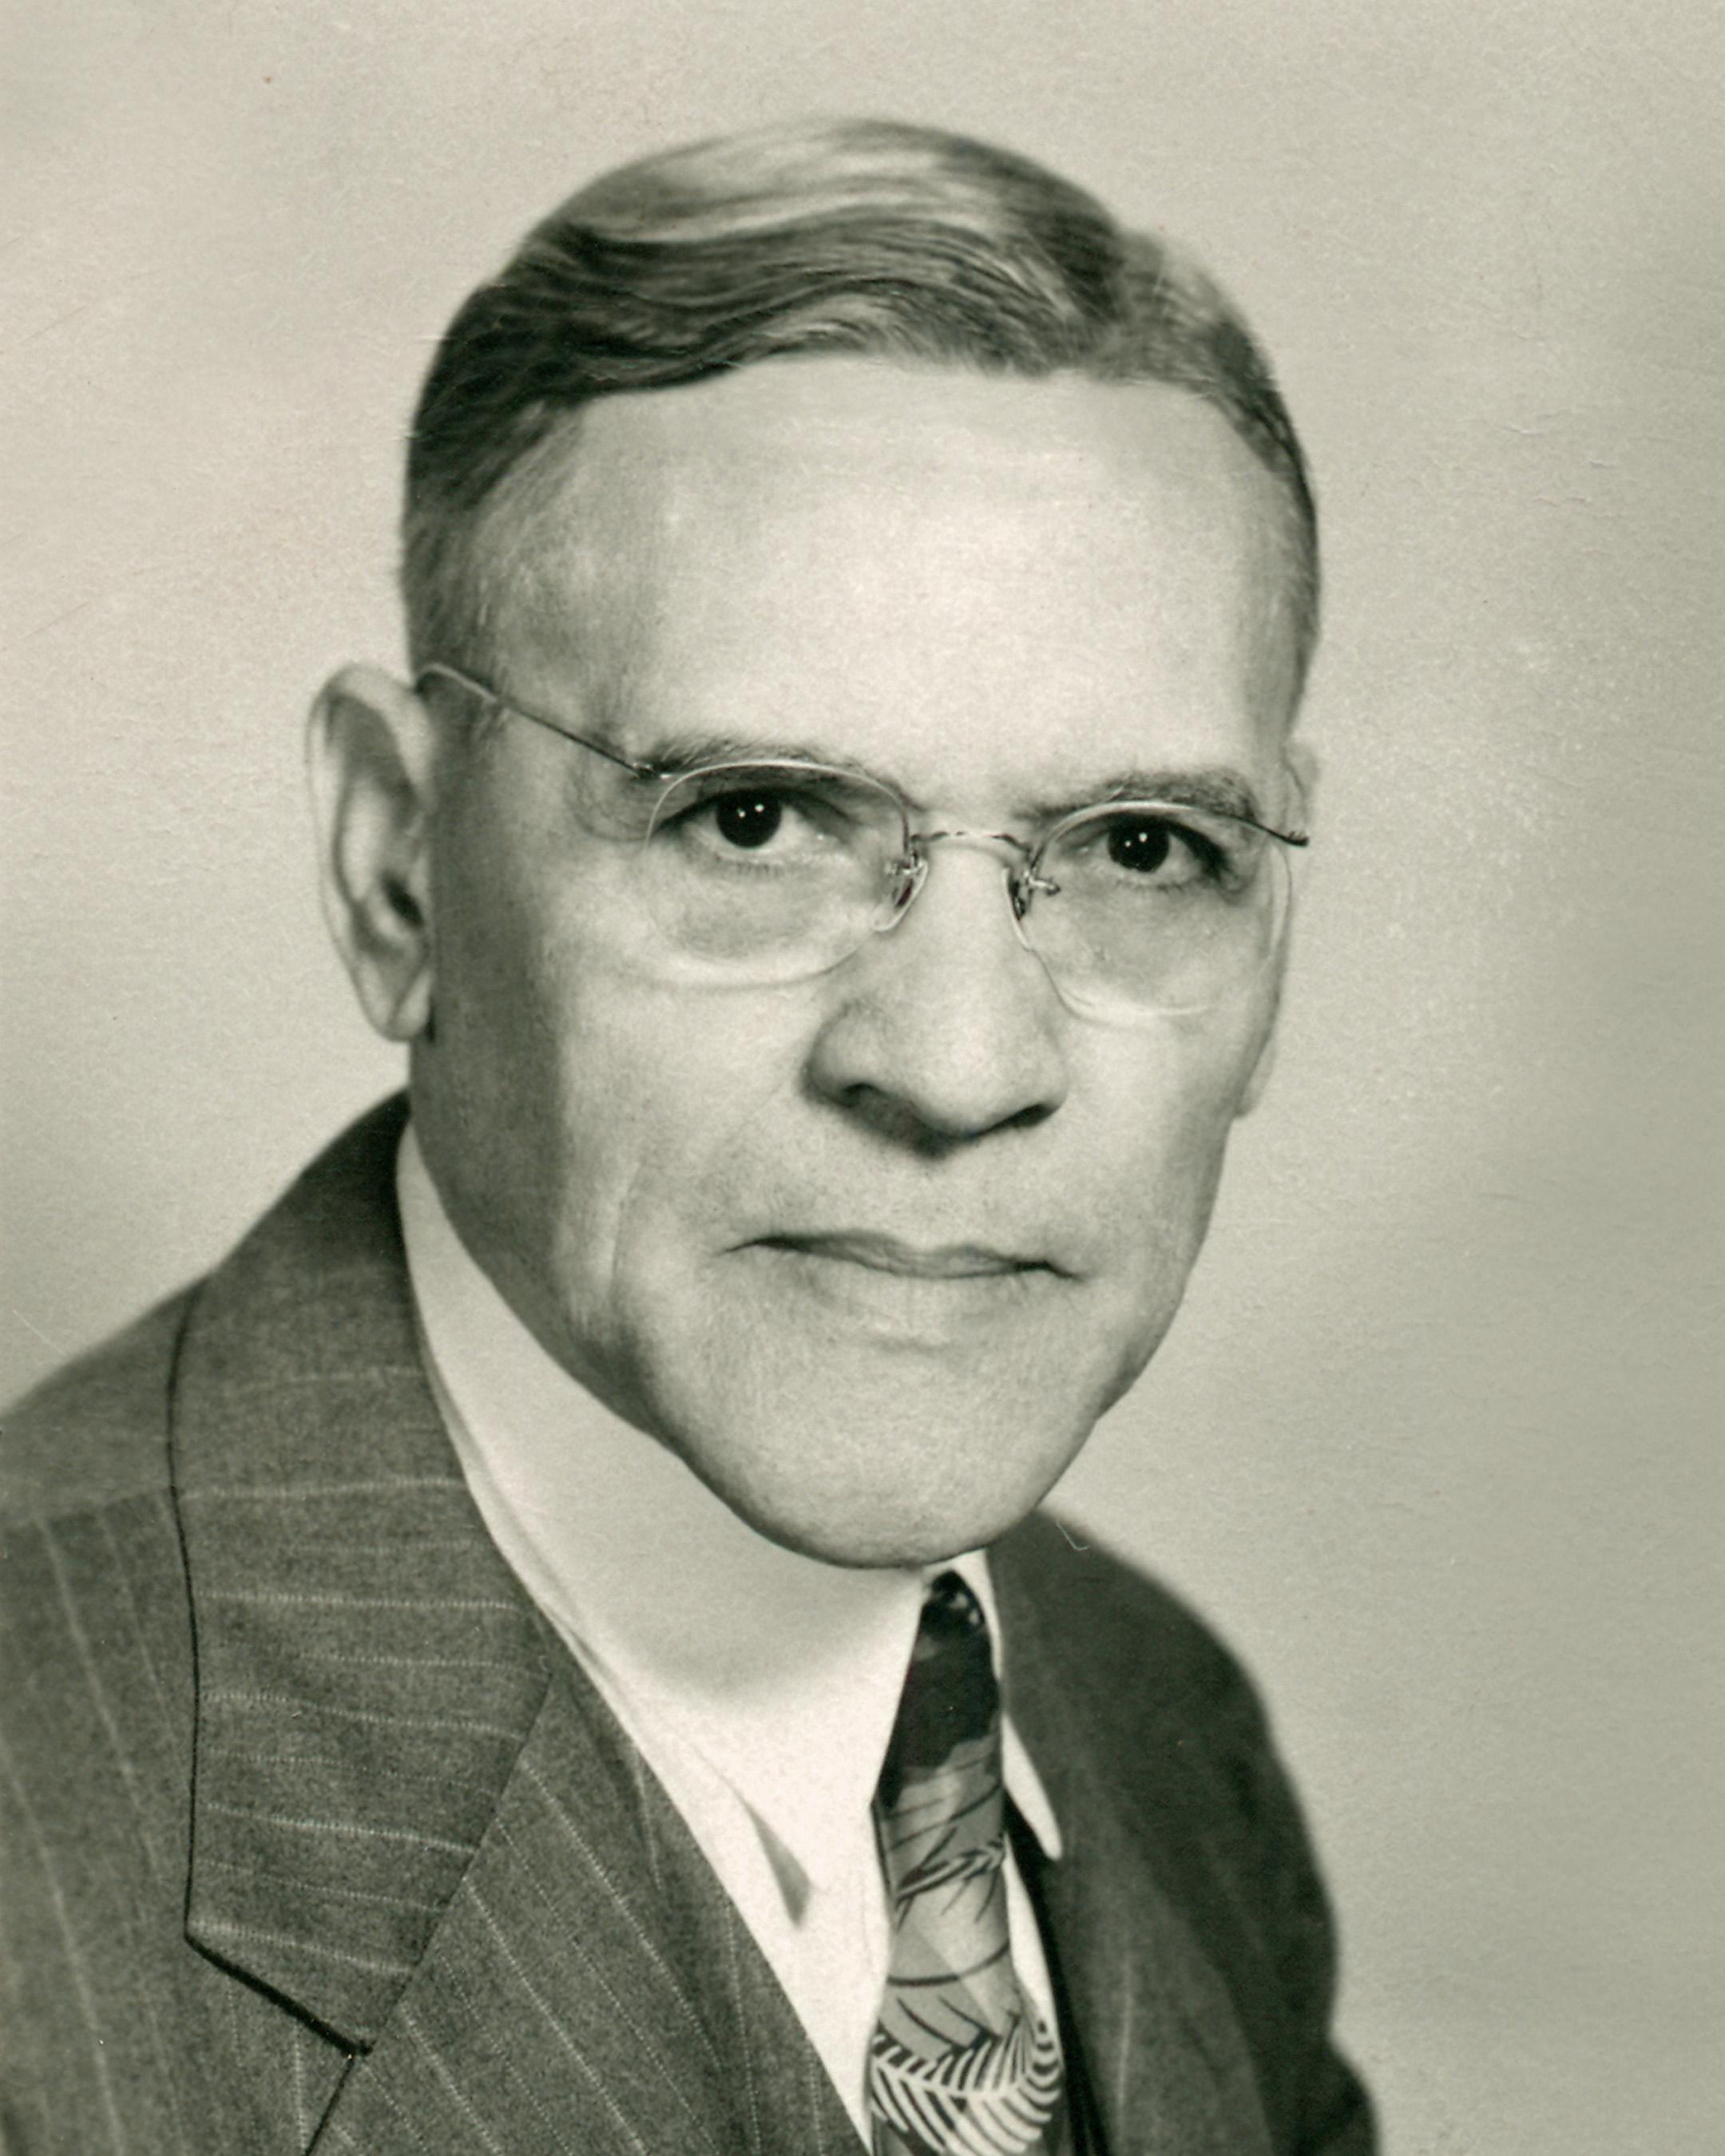 John A. Hodge